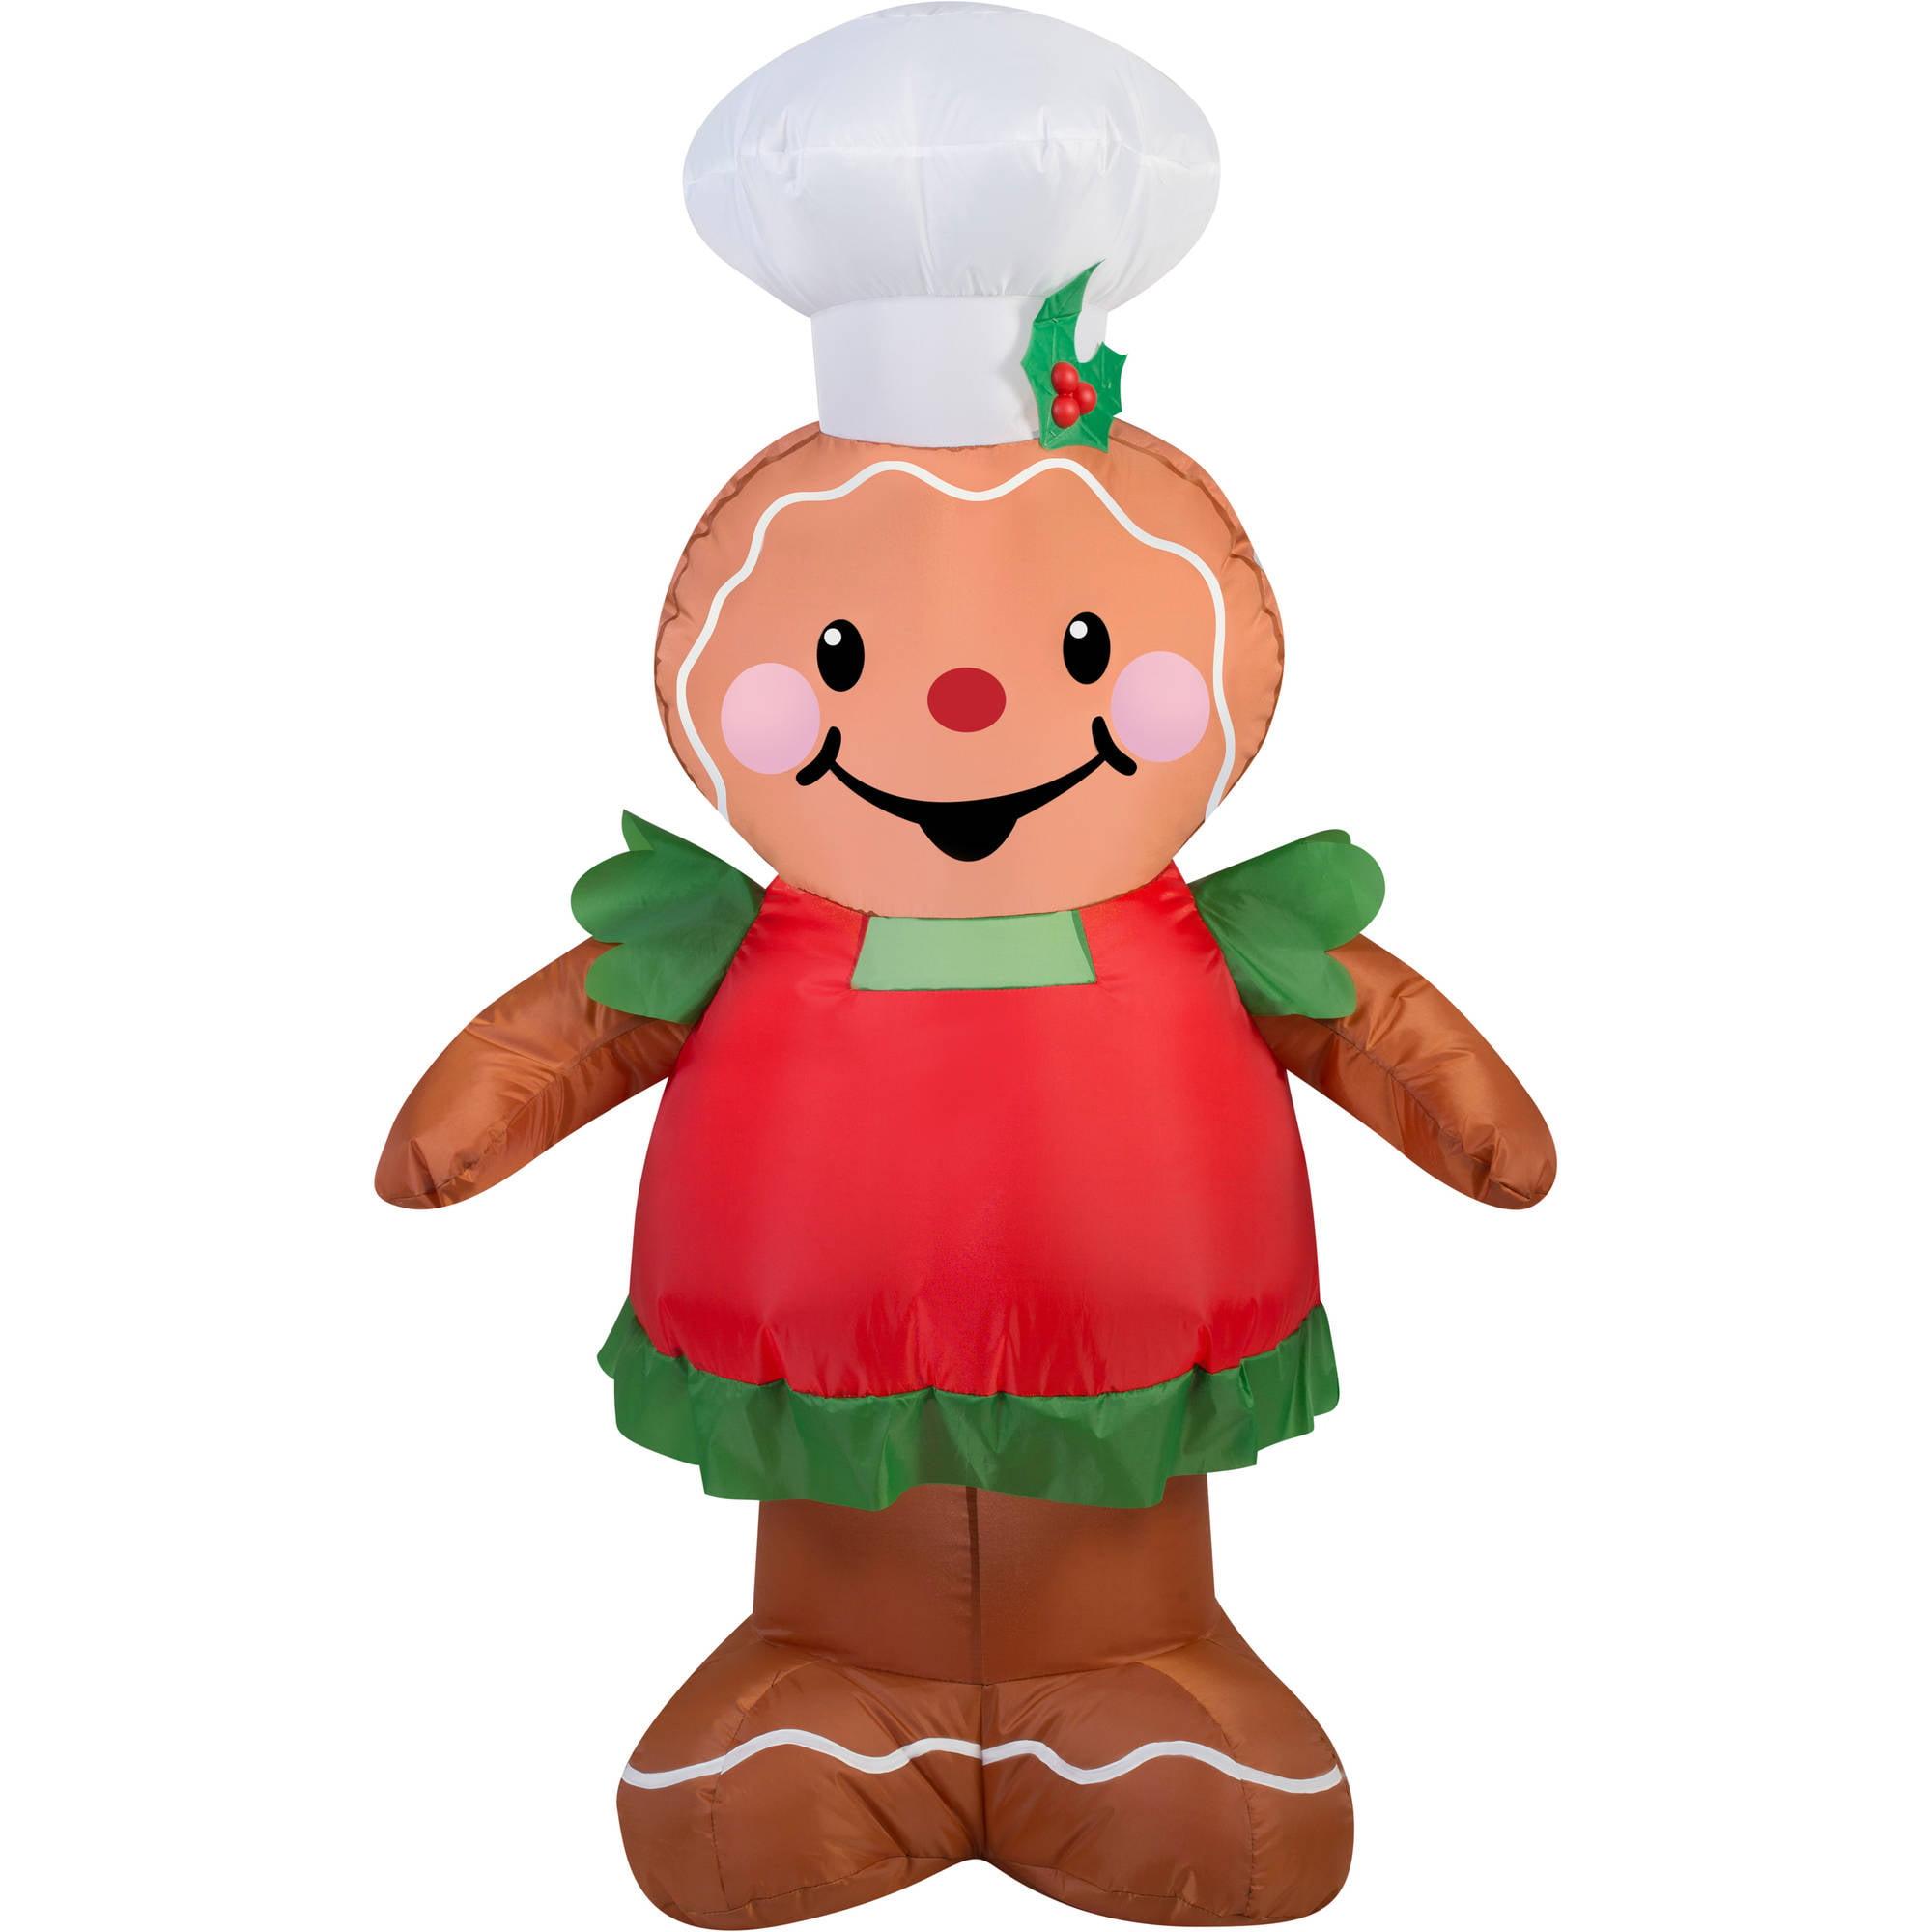 gemmy airblown christmas inflatables gingerbread 35 walmartcom - Inflatable Gingerbread Man Christmas Decor